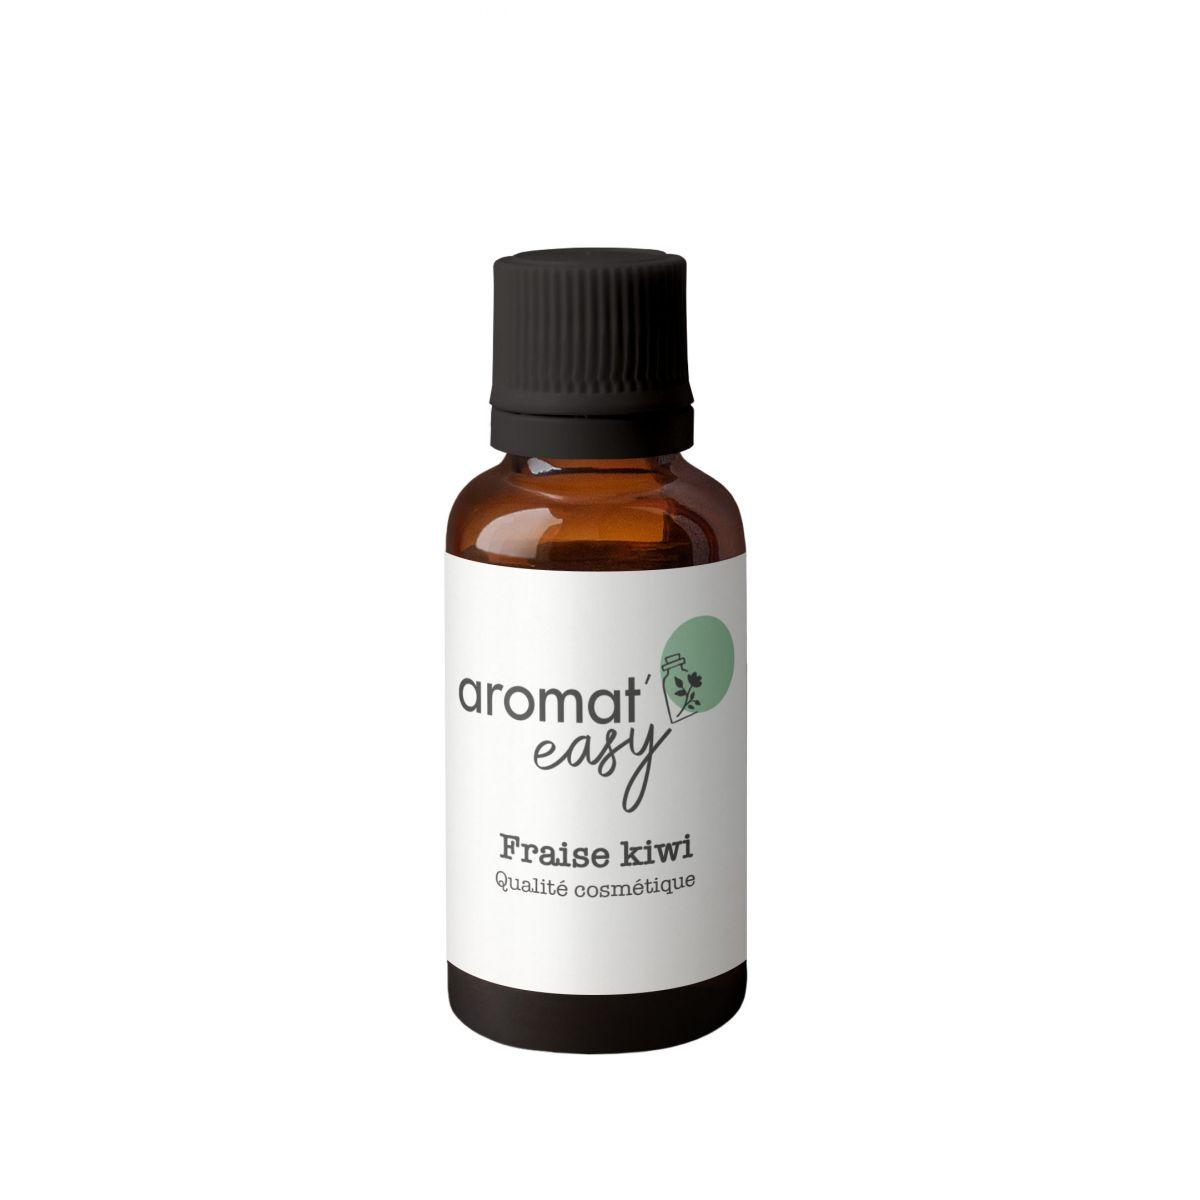 Fragrance Fraise kiwi